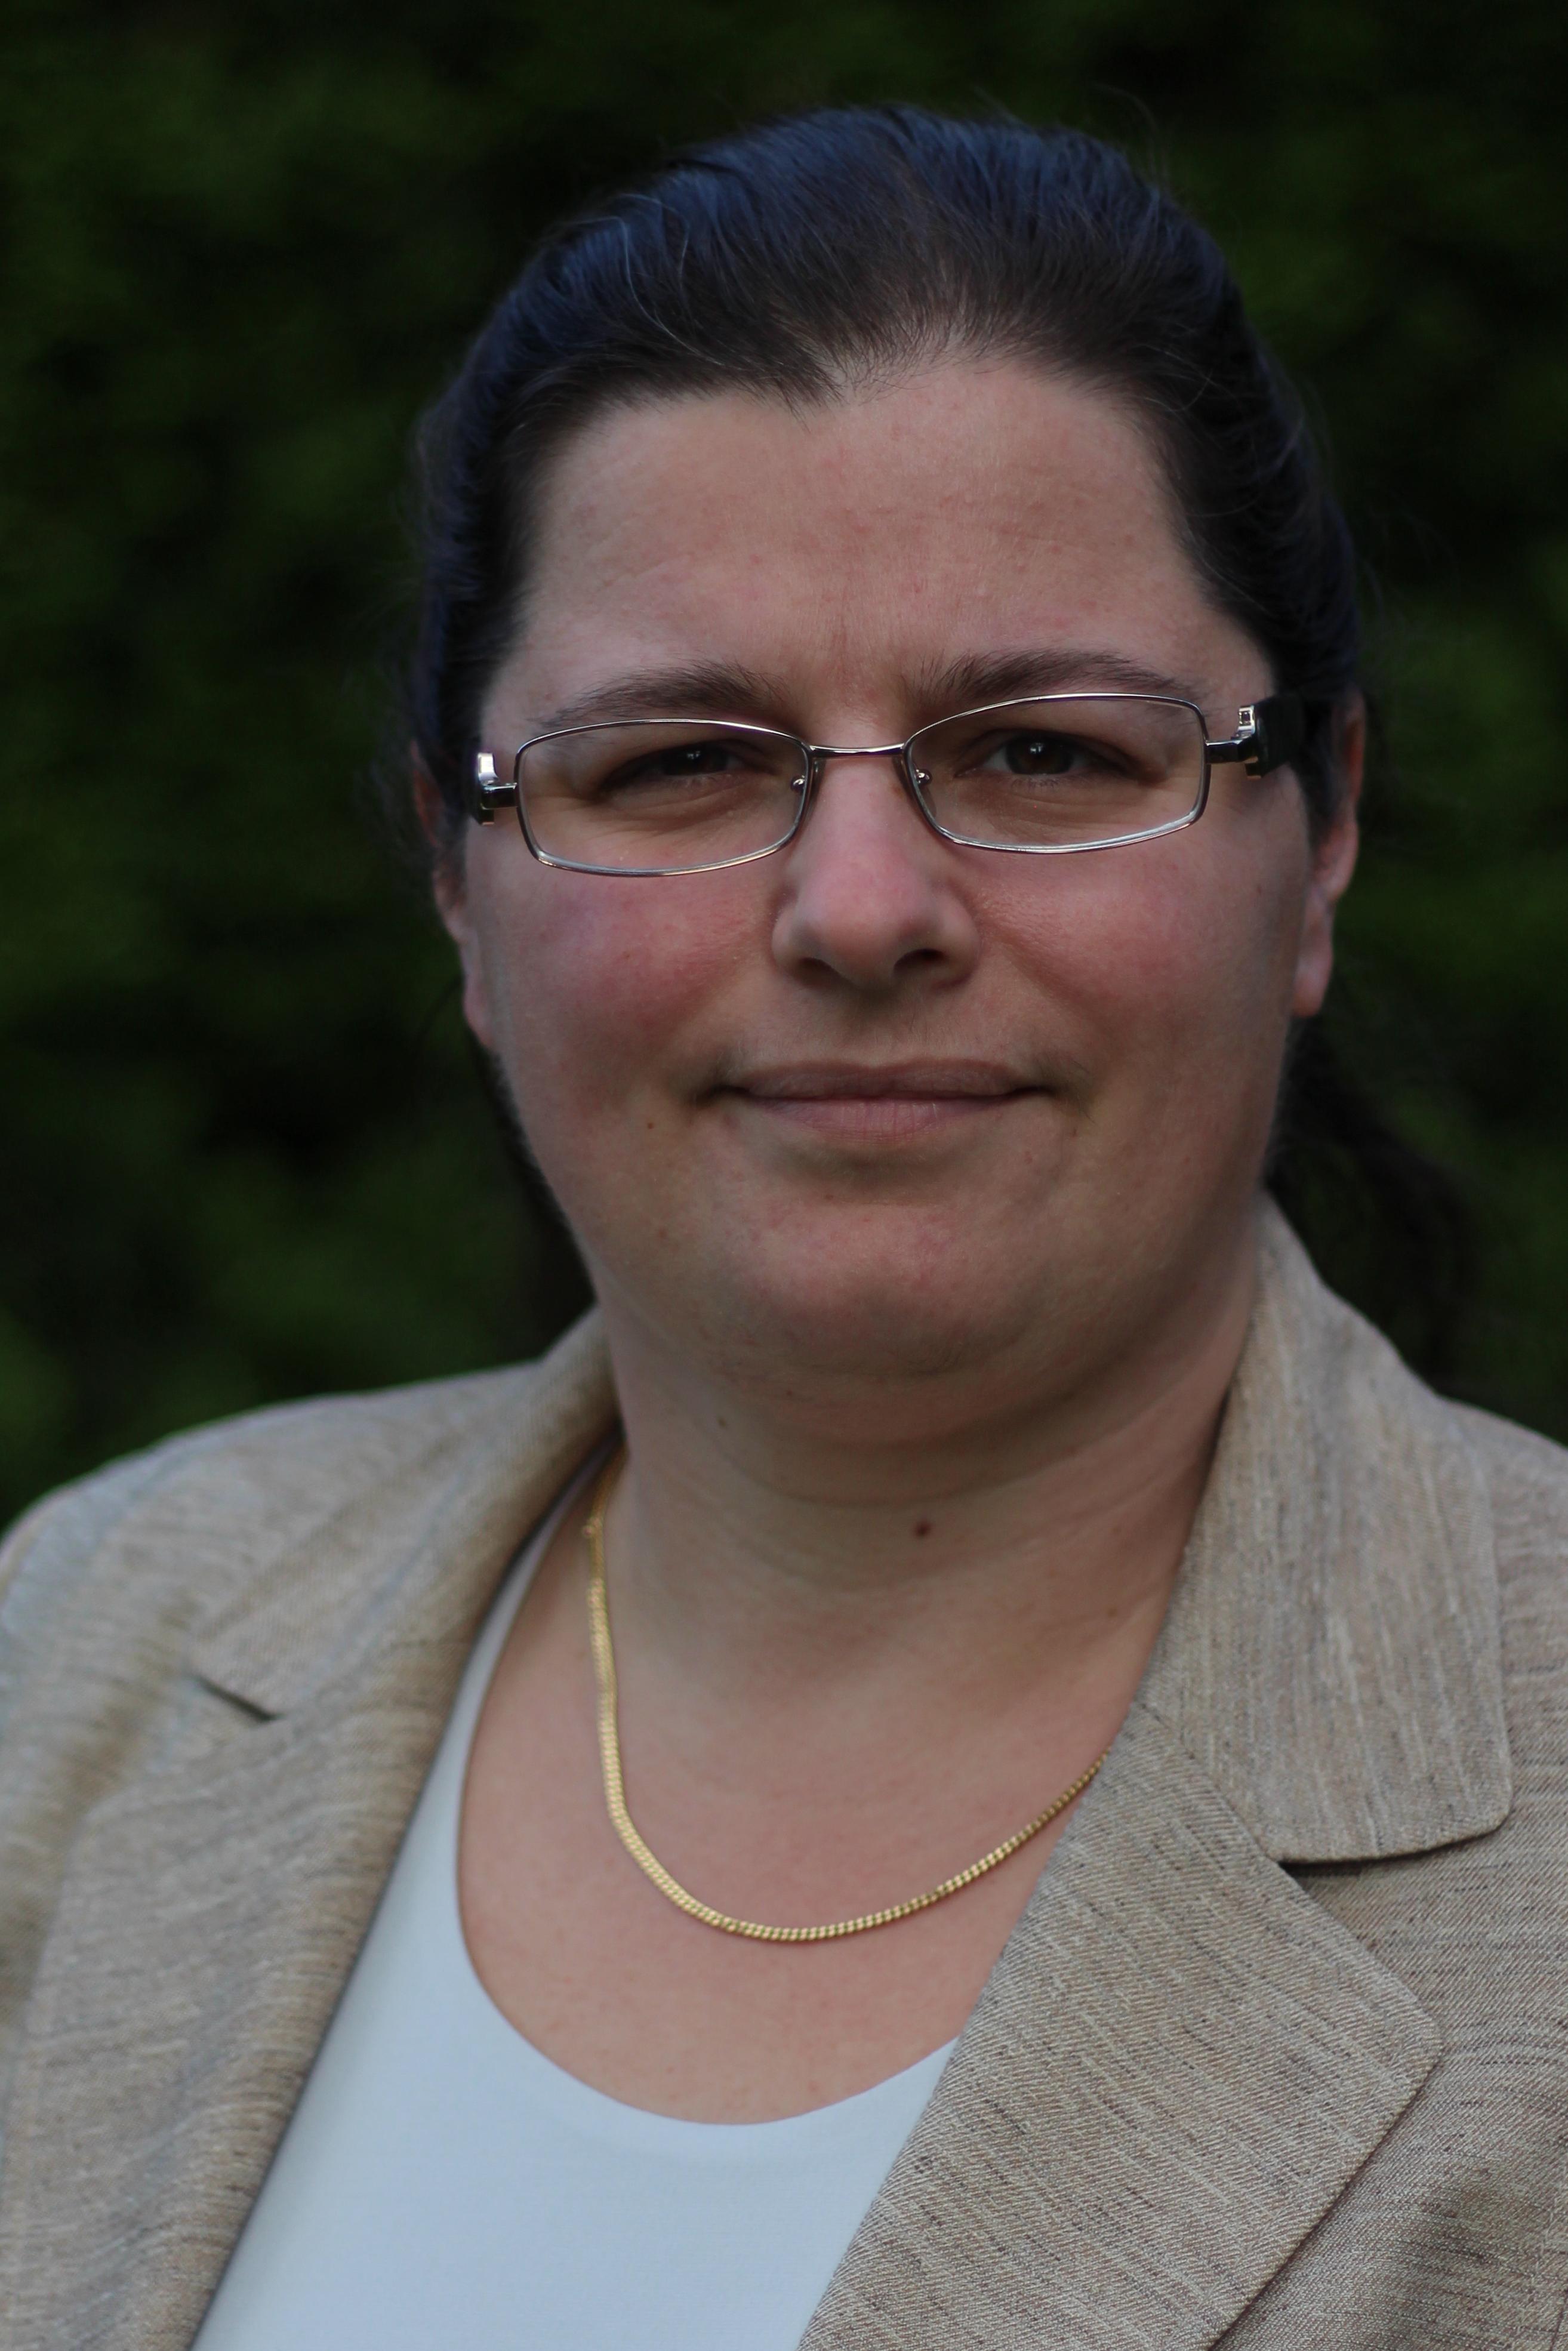 Oreola Donini